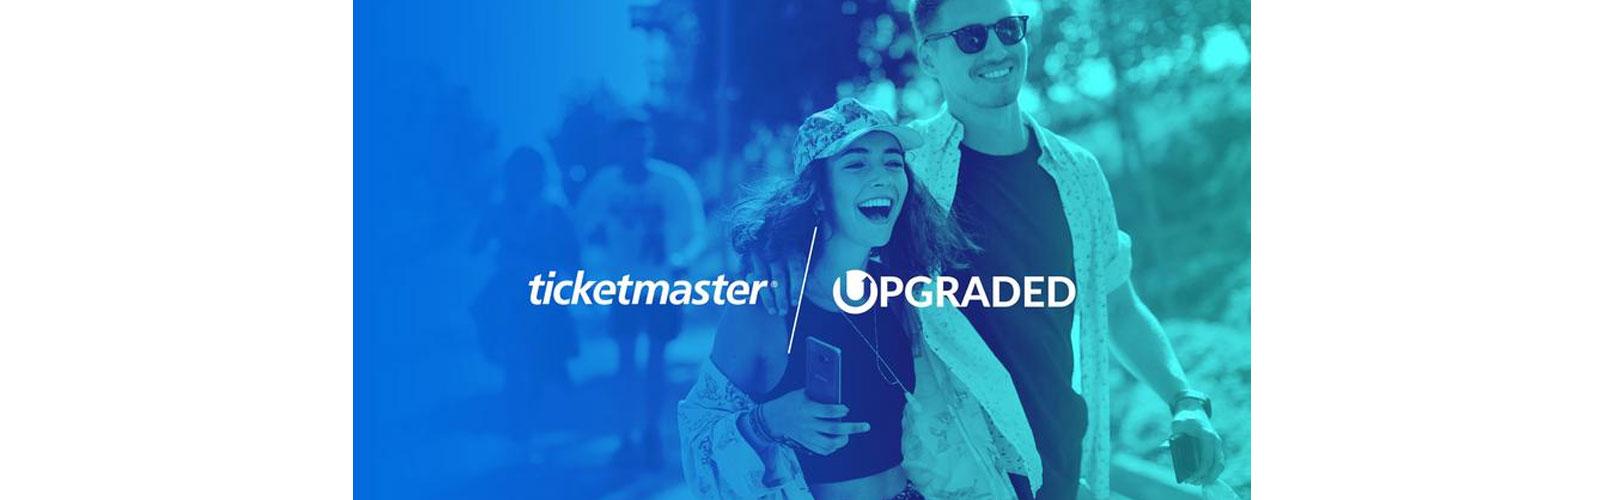 ticketmaster-upgraded